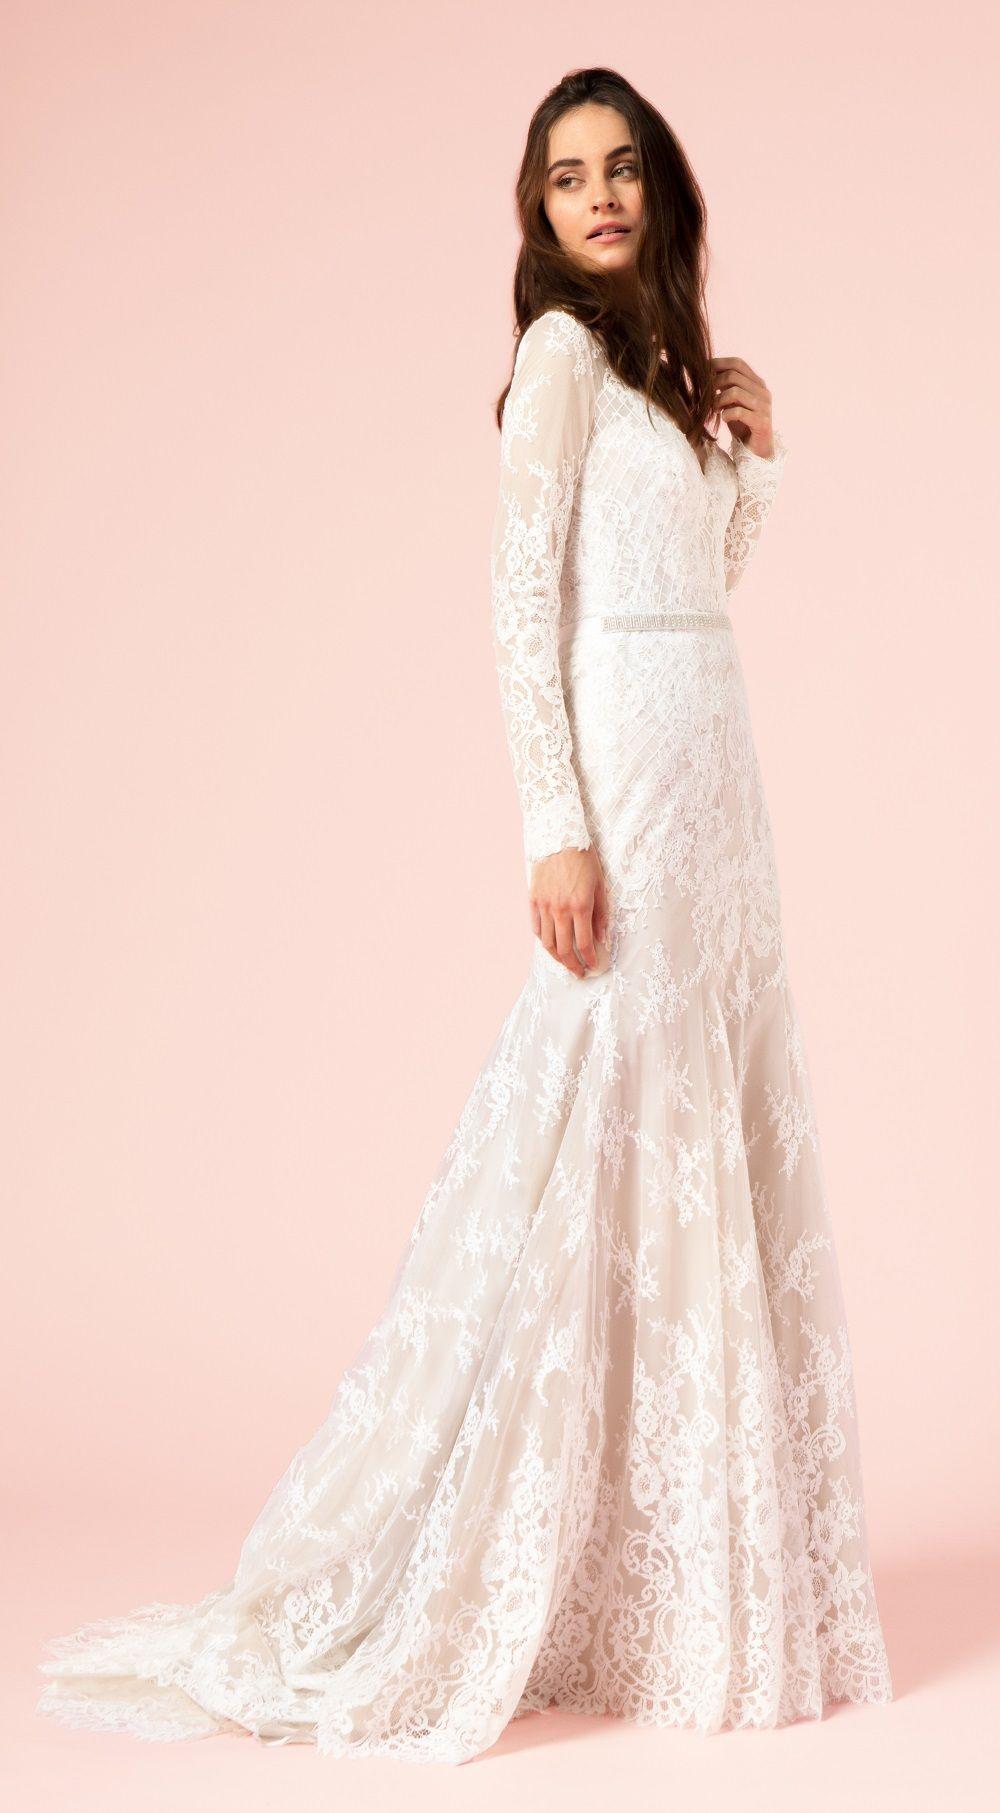 Lace Trumpet Wedding Dress   Long Sleeved Wedding Dresses ...